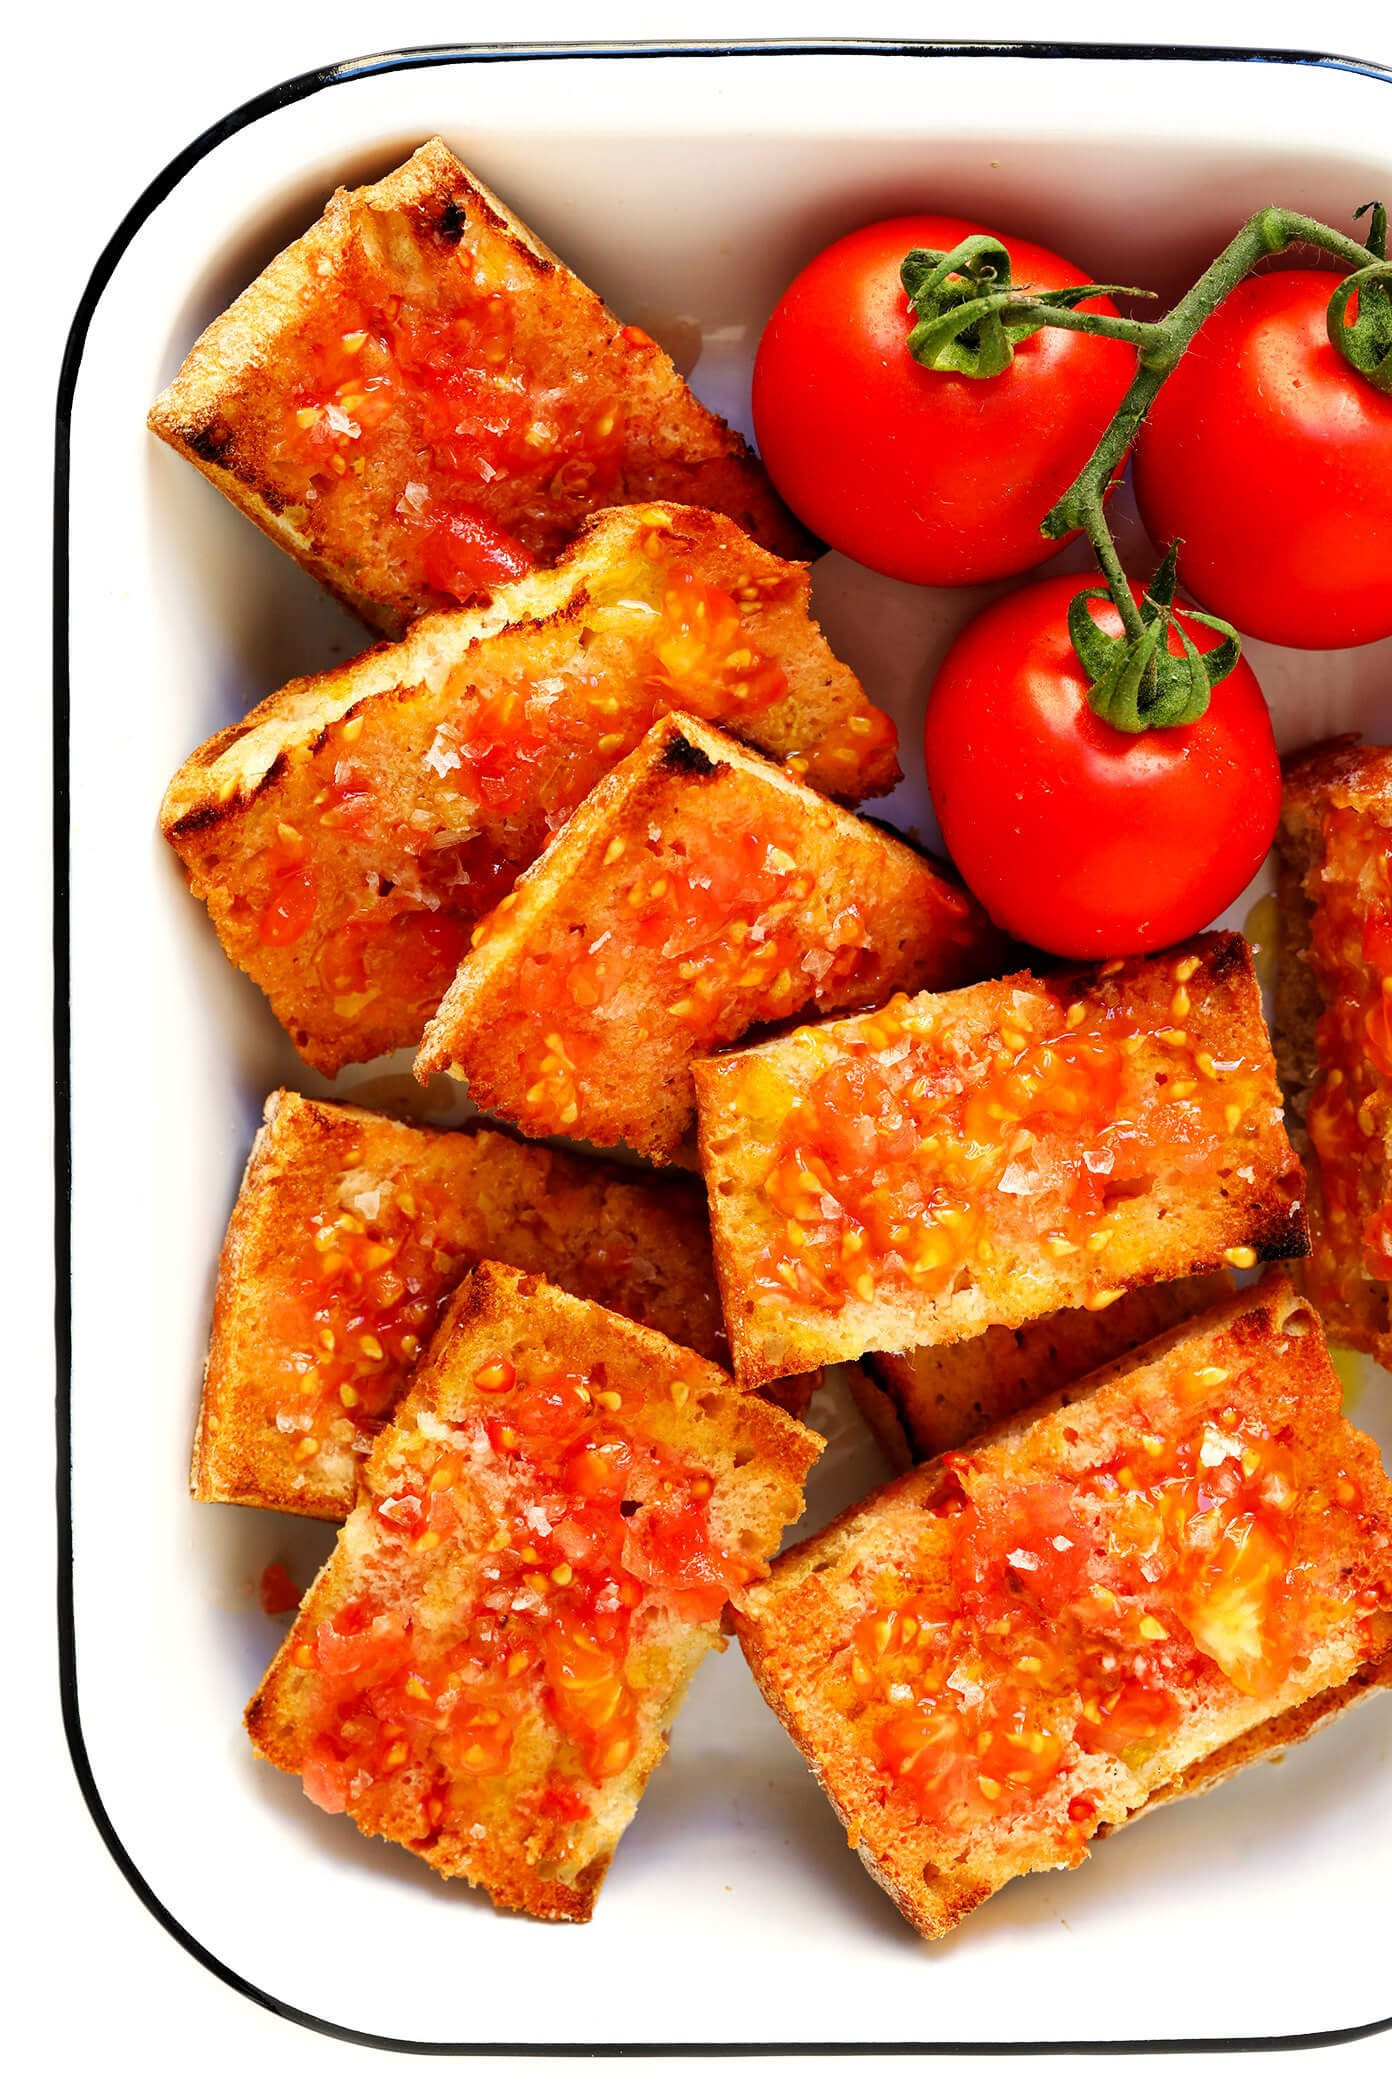 Catalan Tomato Bread (Pan Con Tomate | Pa Amb Tomàquet)